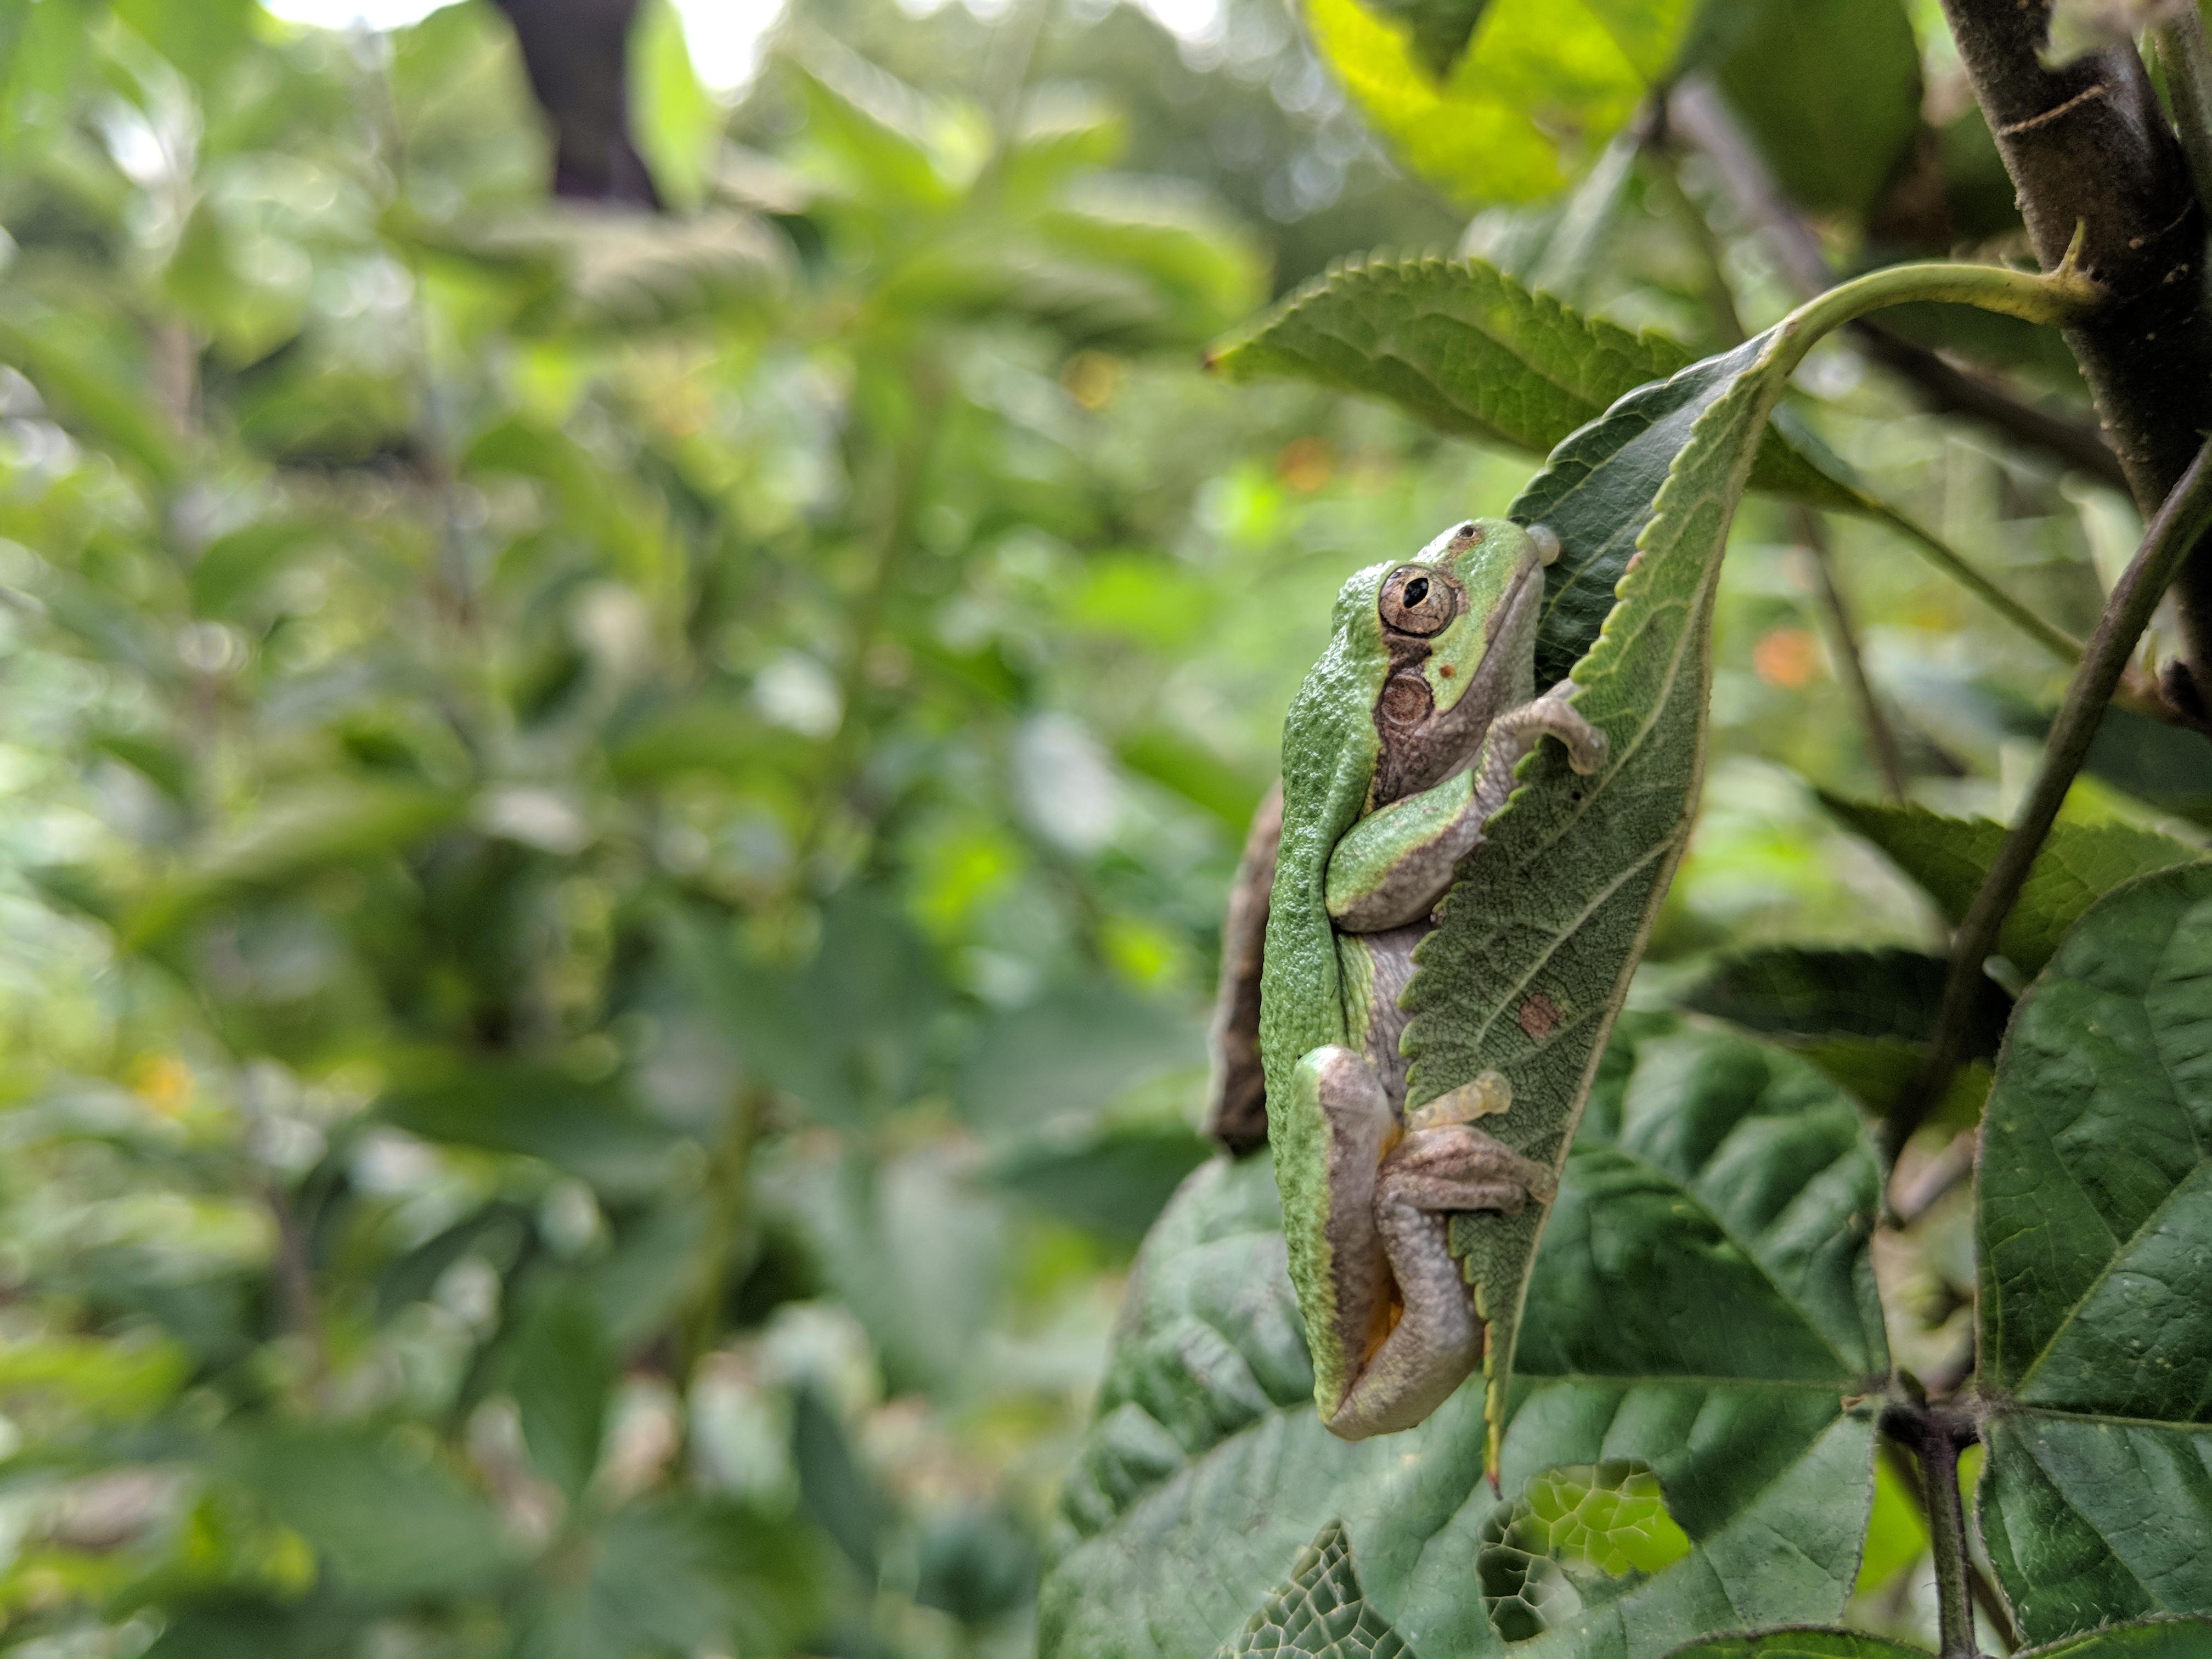 Gray Treefrog (Dryophytes versicolor)